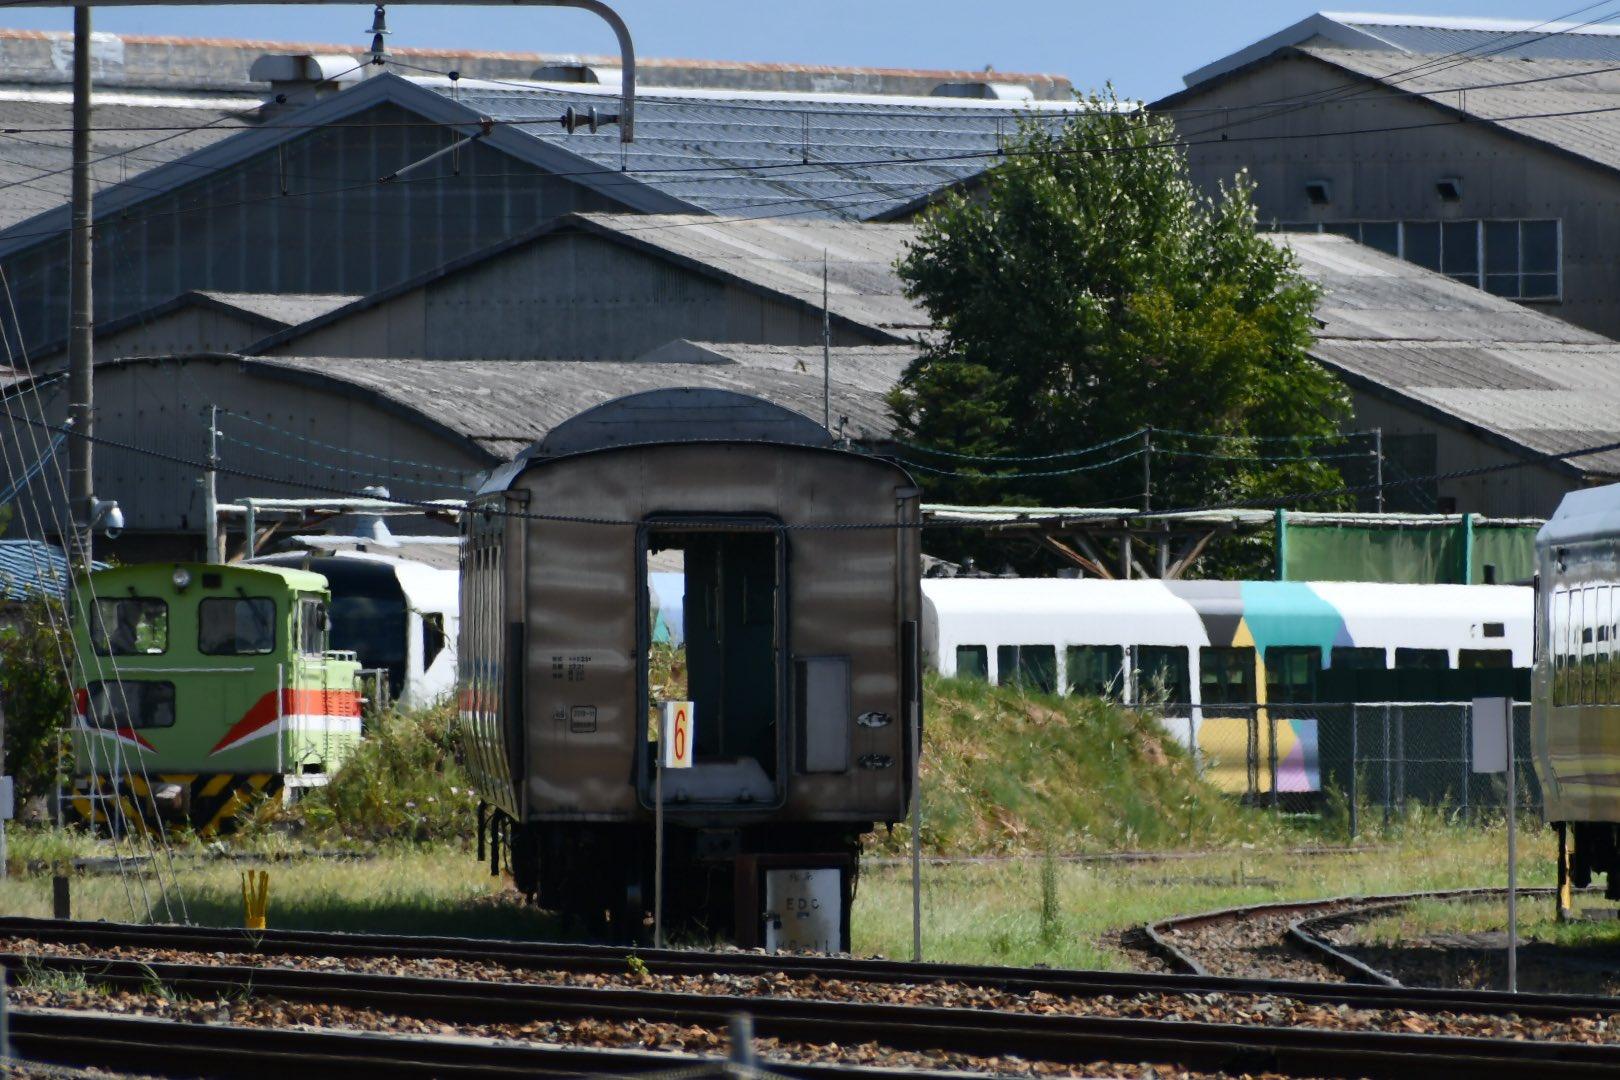 【E257系解体】長野総合車両センターでM-202編成とM-205編成が解体 あの黒塗り編成も